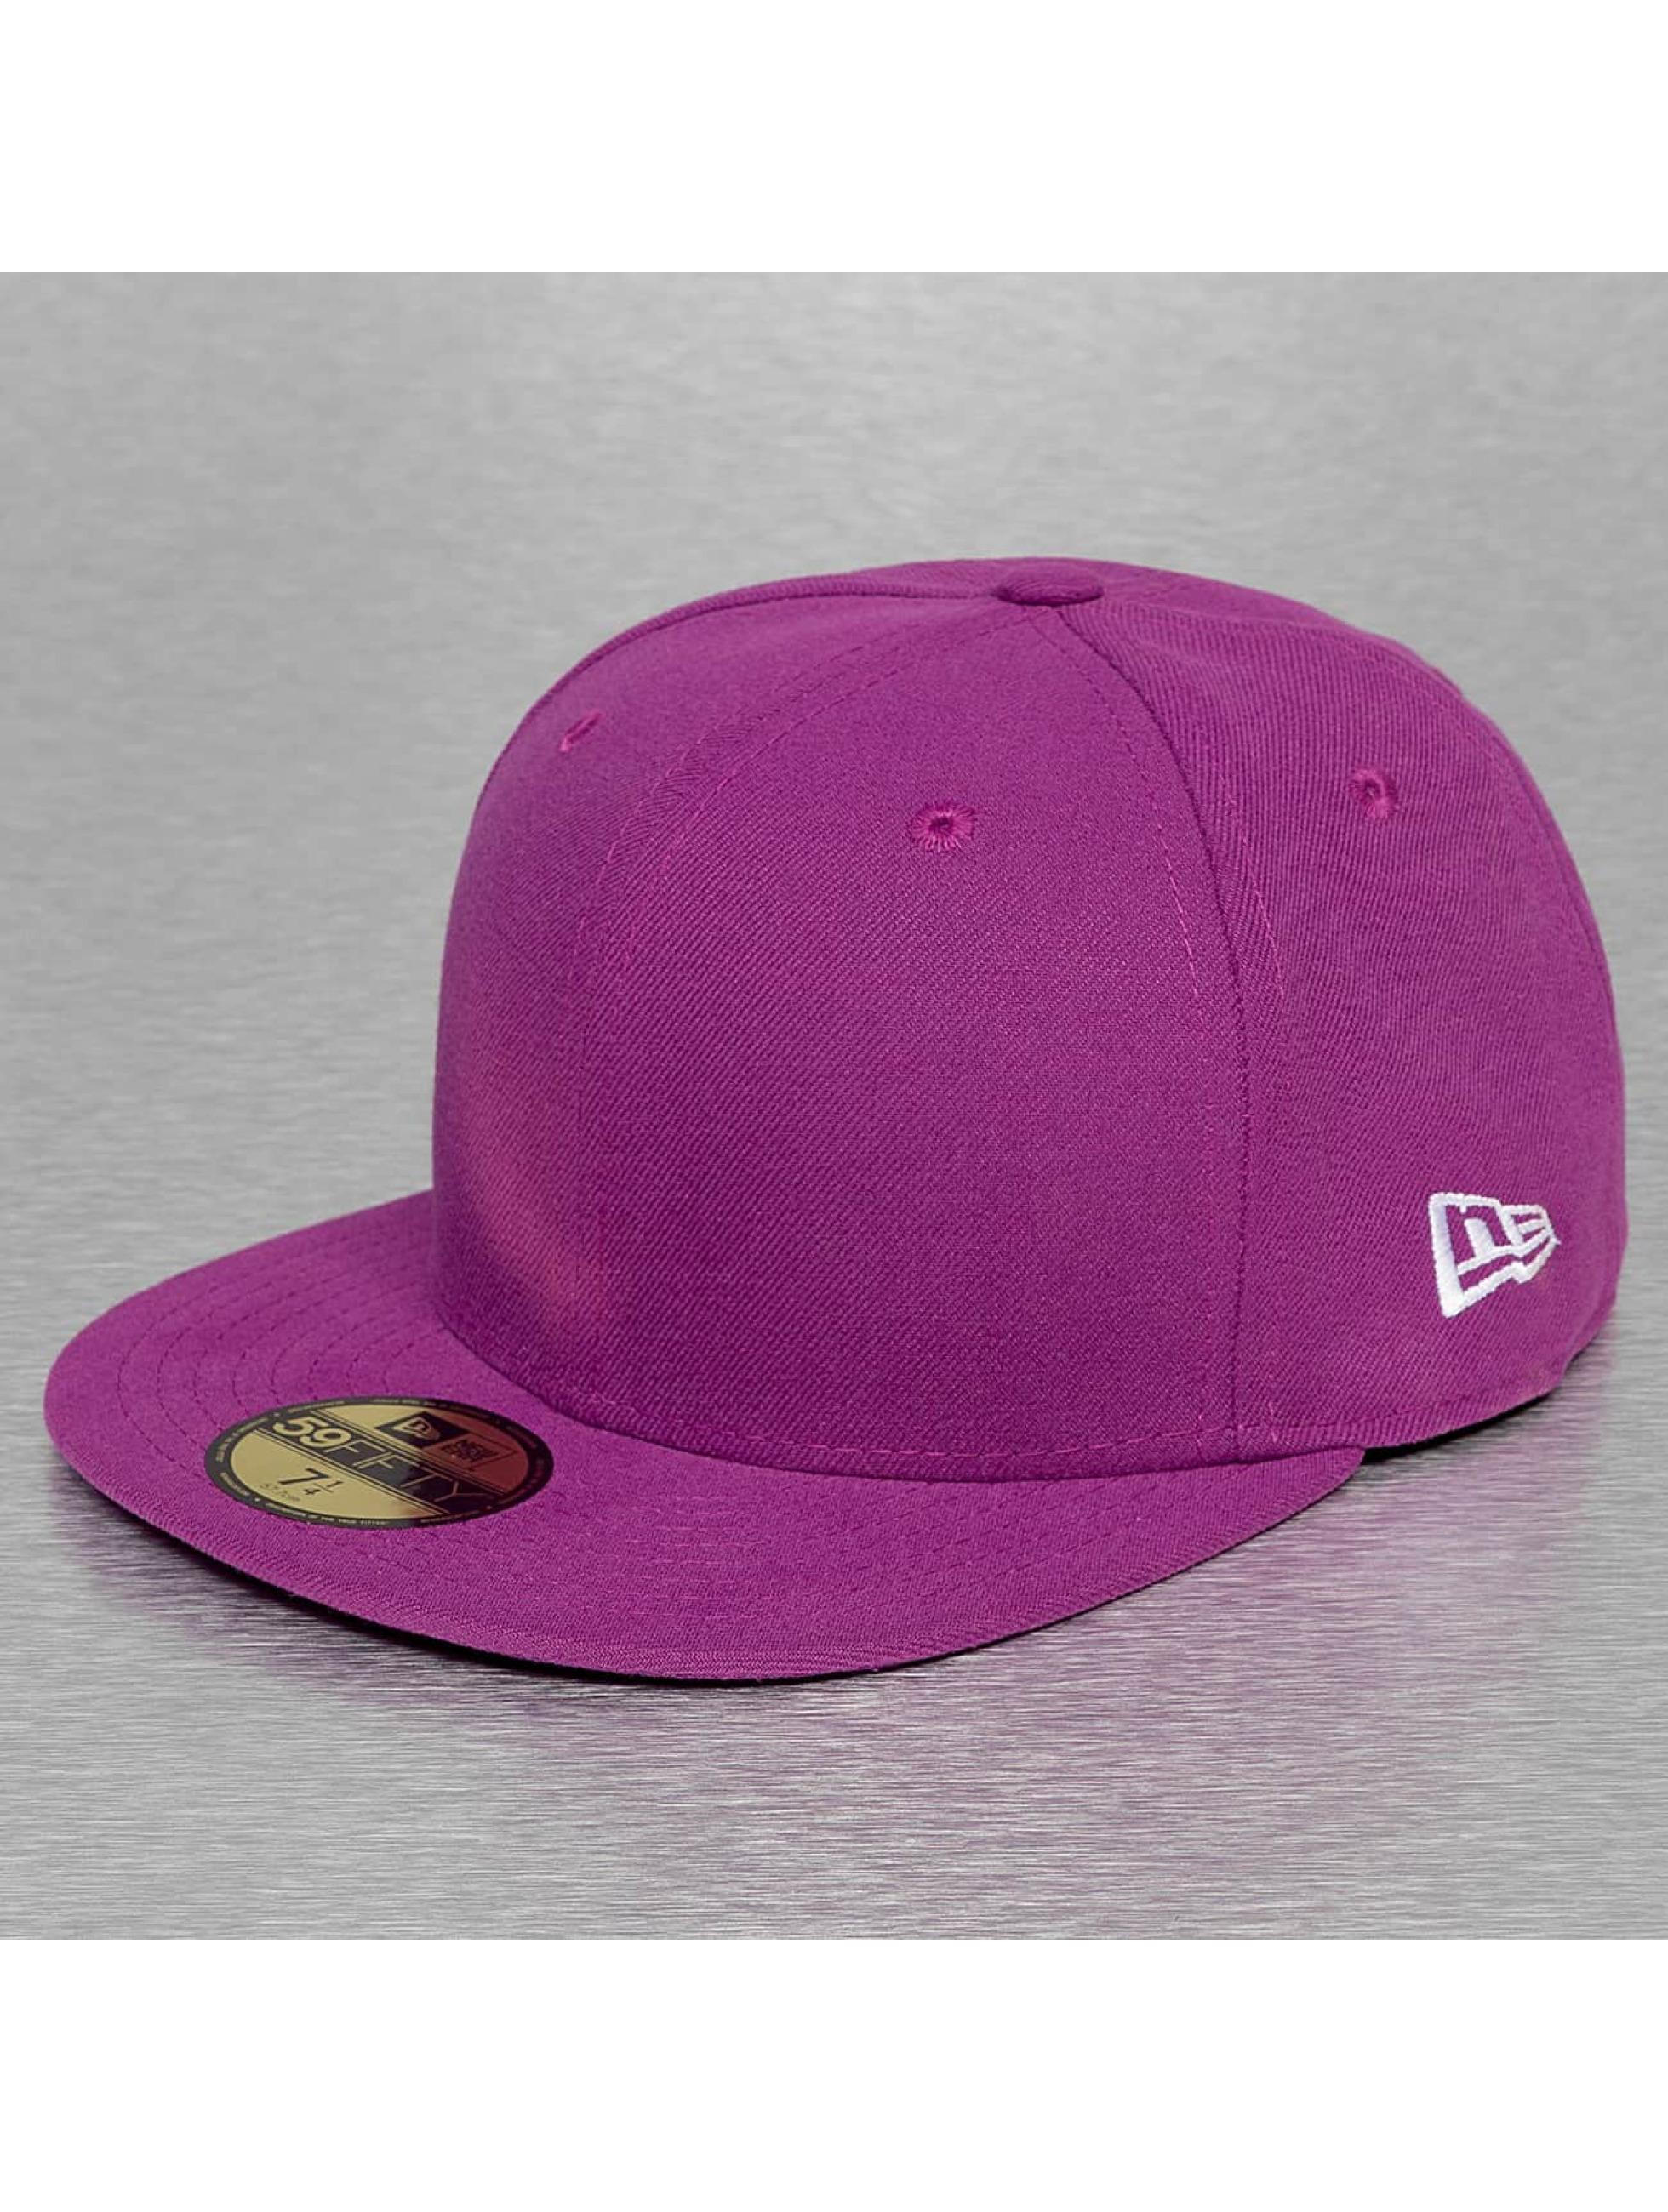 New Era Бейсболка Original Basic 59Fifty пурпурный